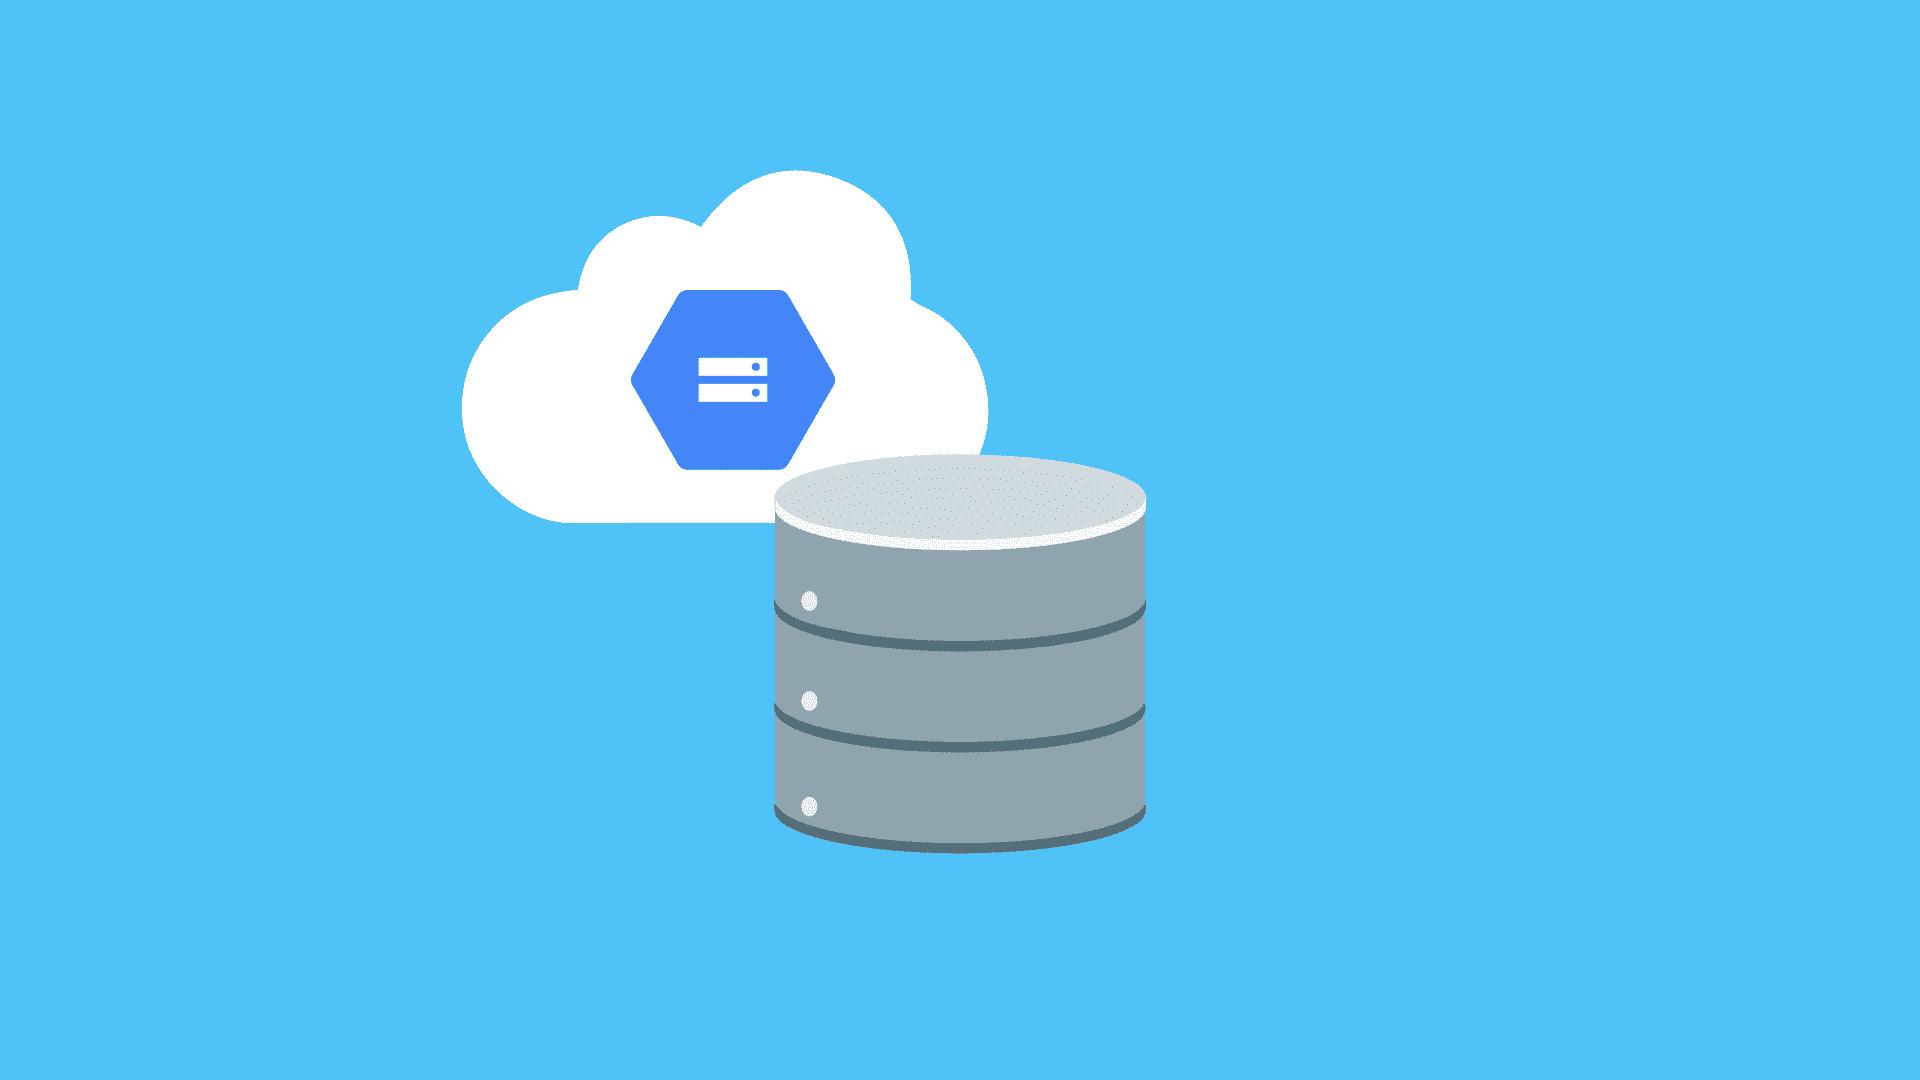 Cloud database